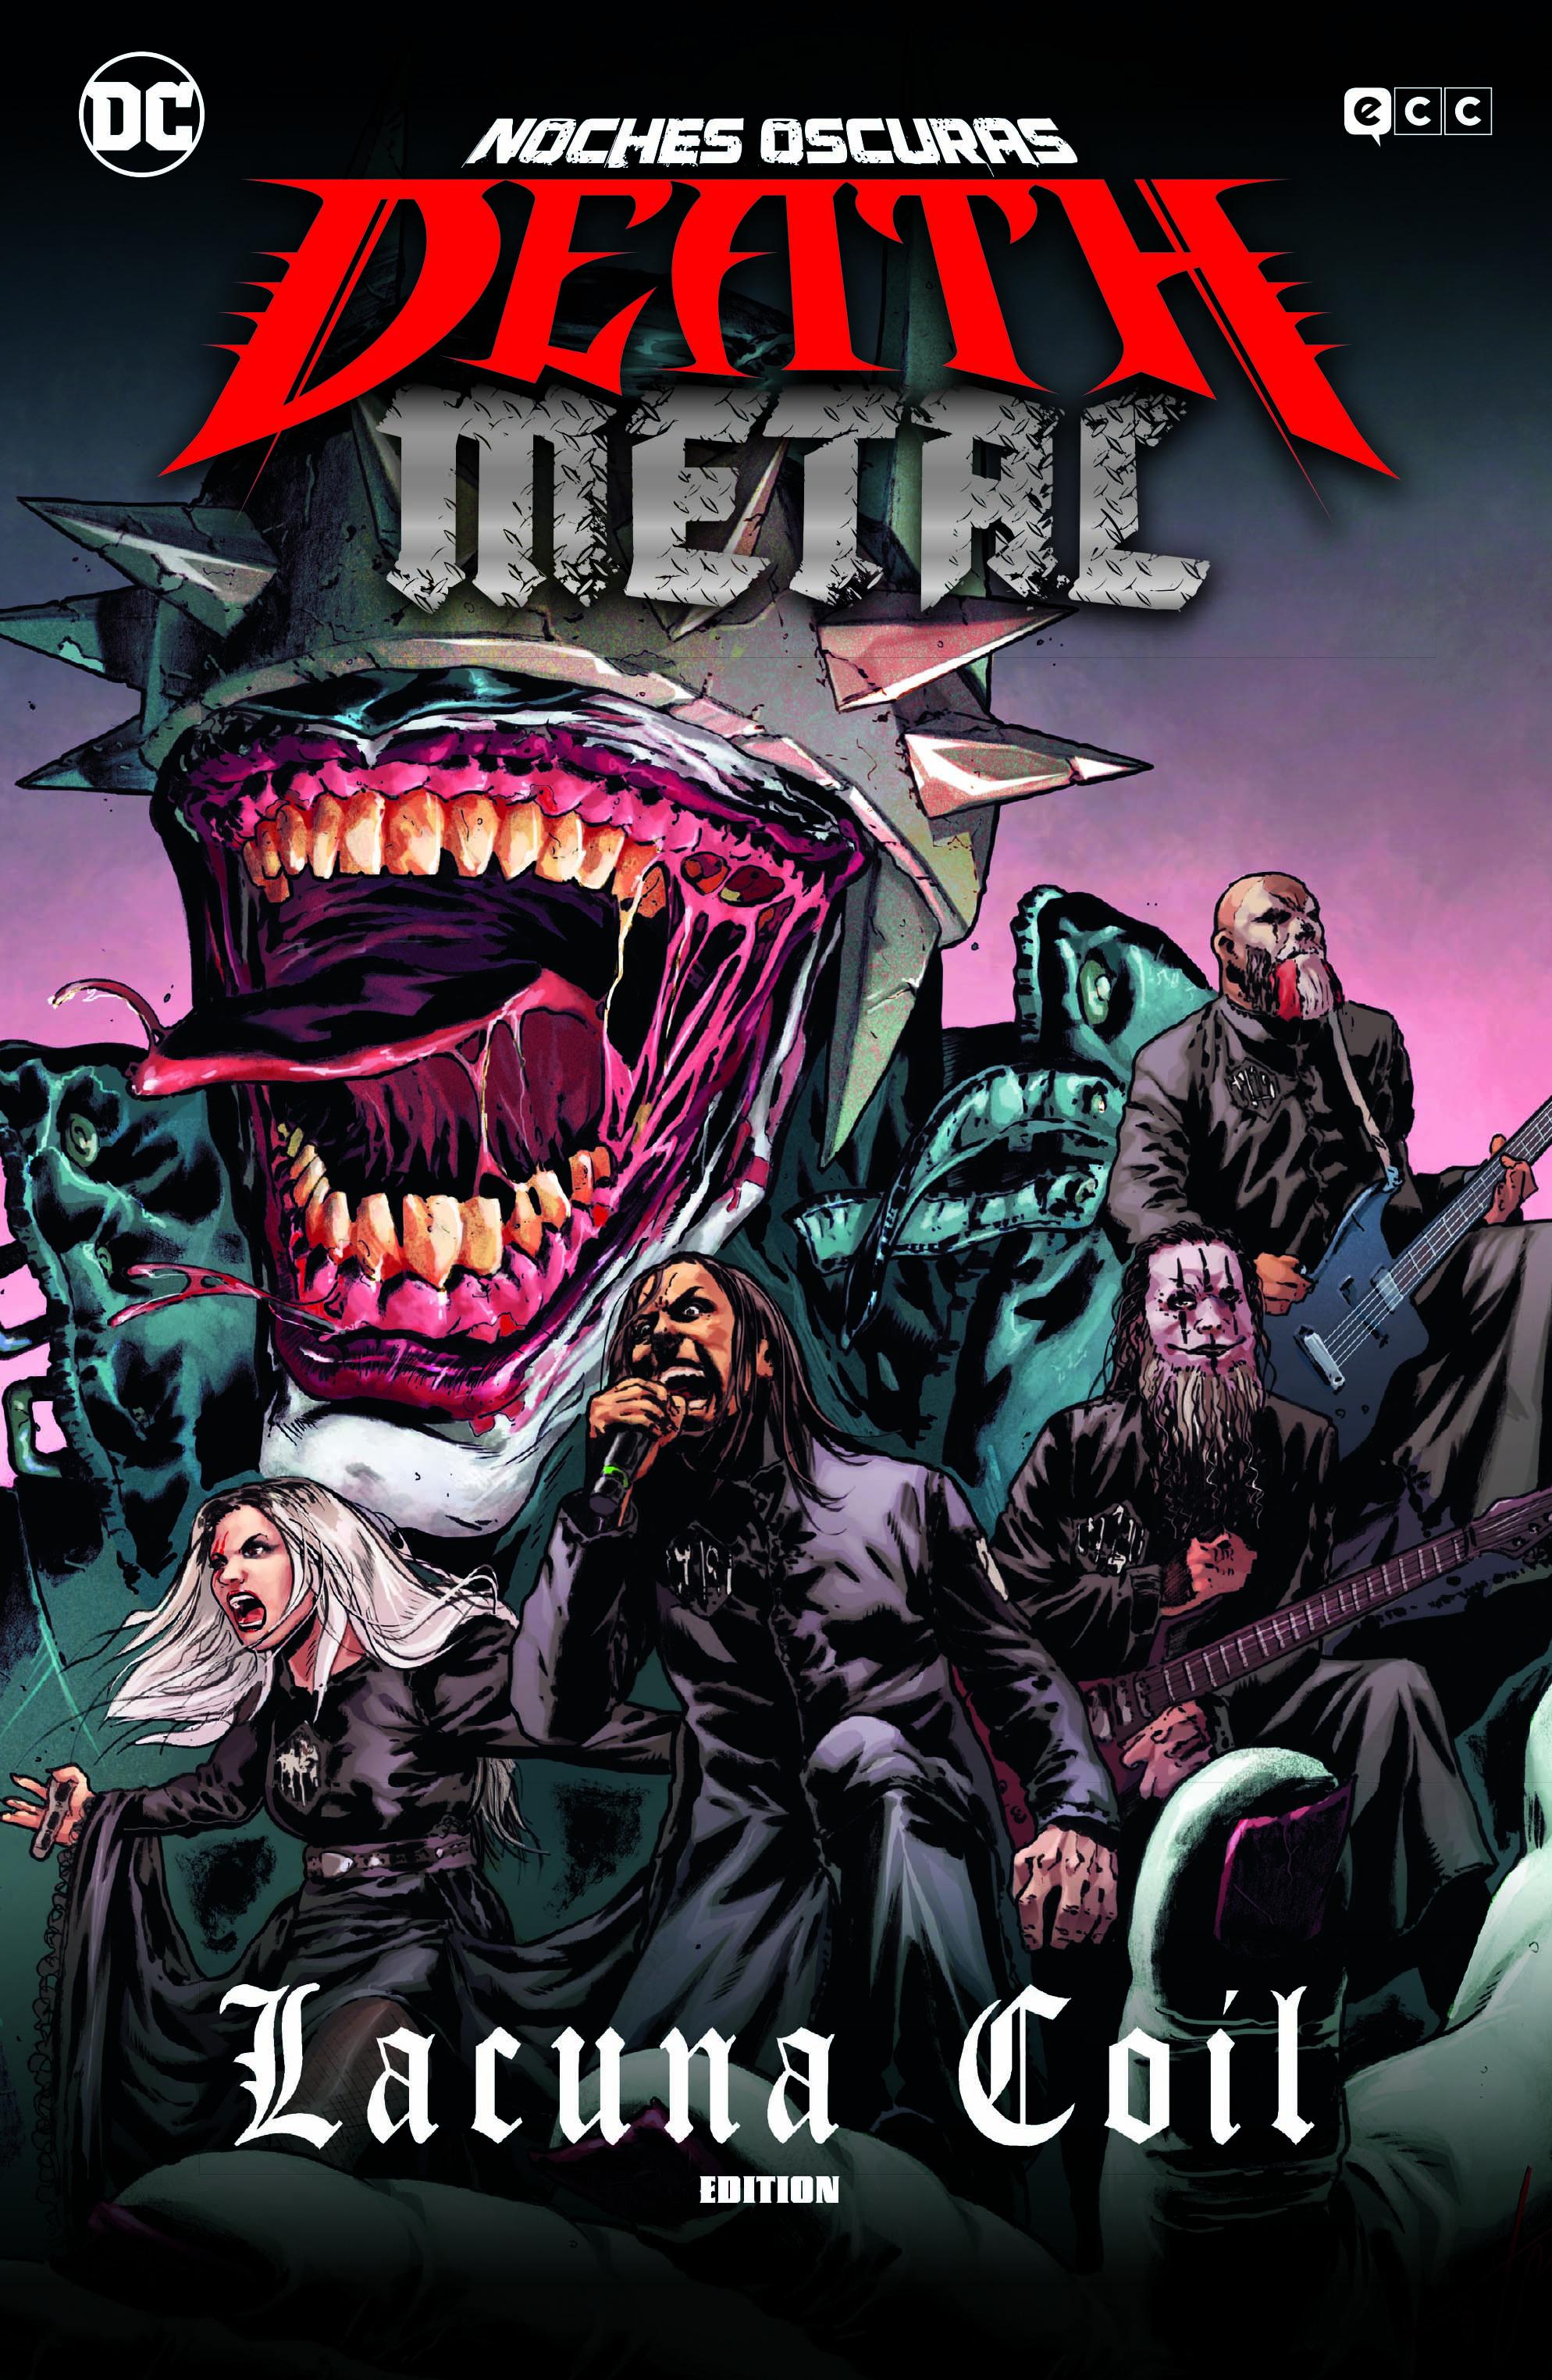 Noches oscuras: Death Metal  #3 de 7 (Lacuna Coil Band Edition) (Rústica)